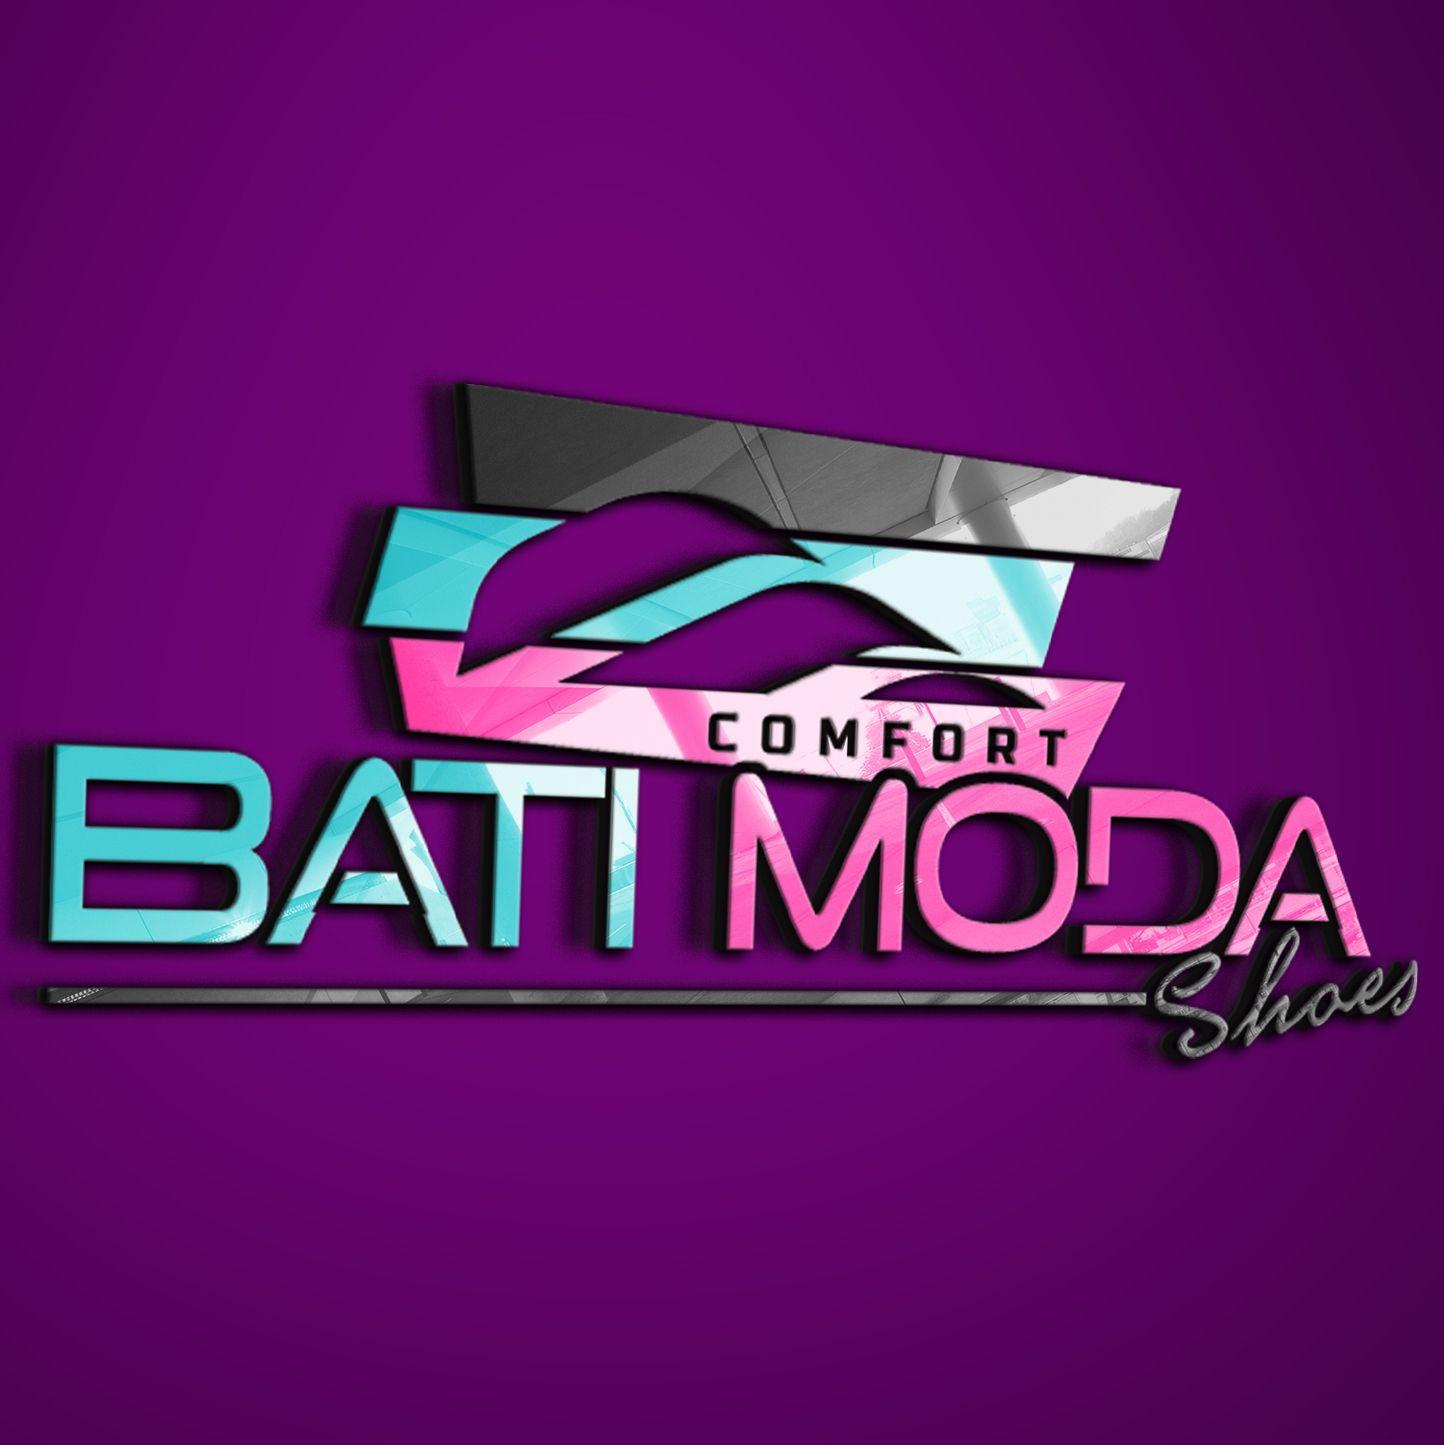 BATI MODA SHOES